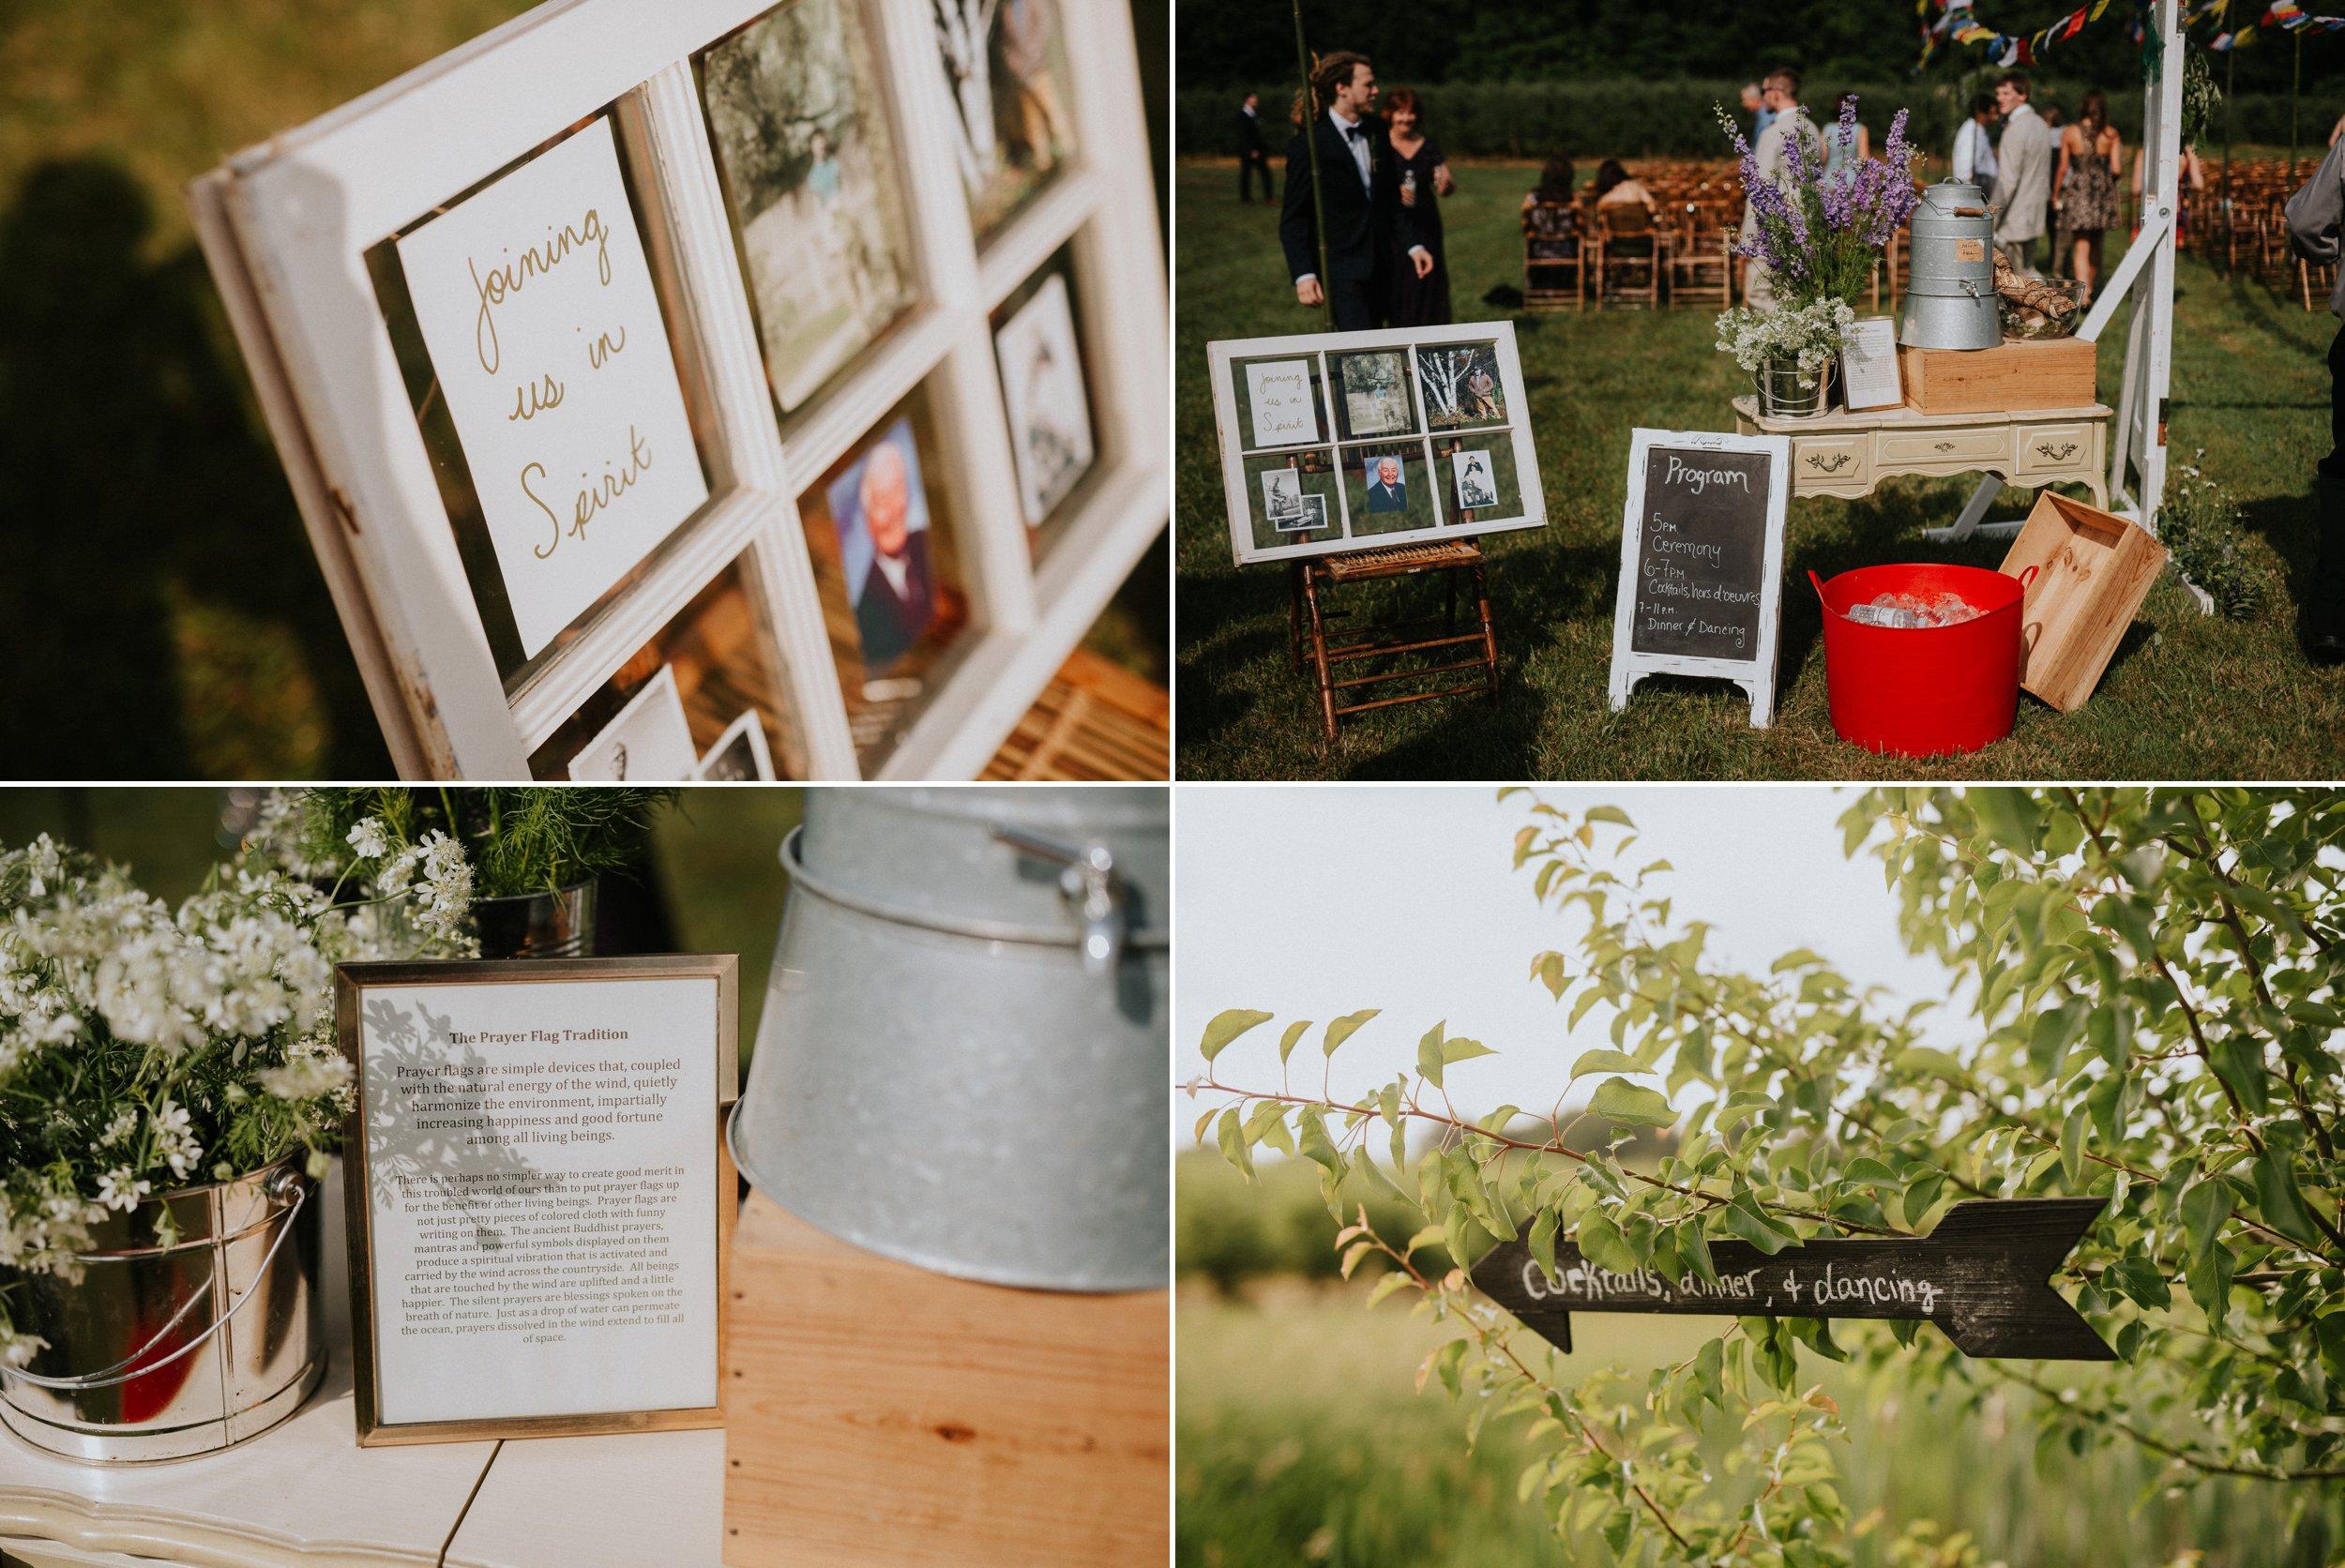 milburn_farms-wedding-16.jpg